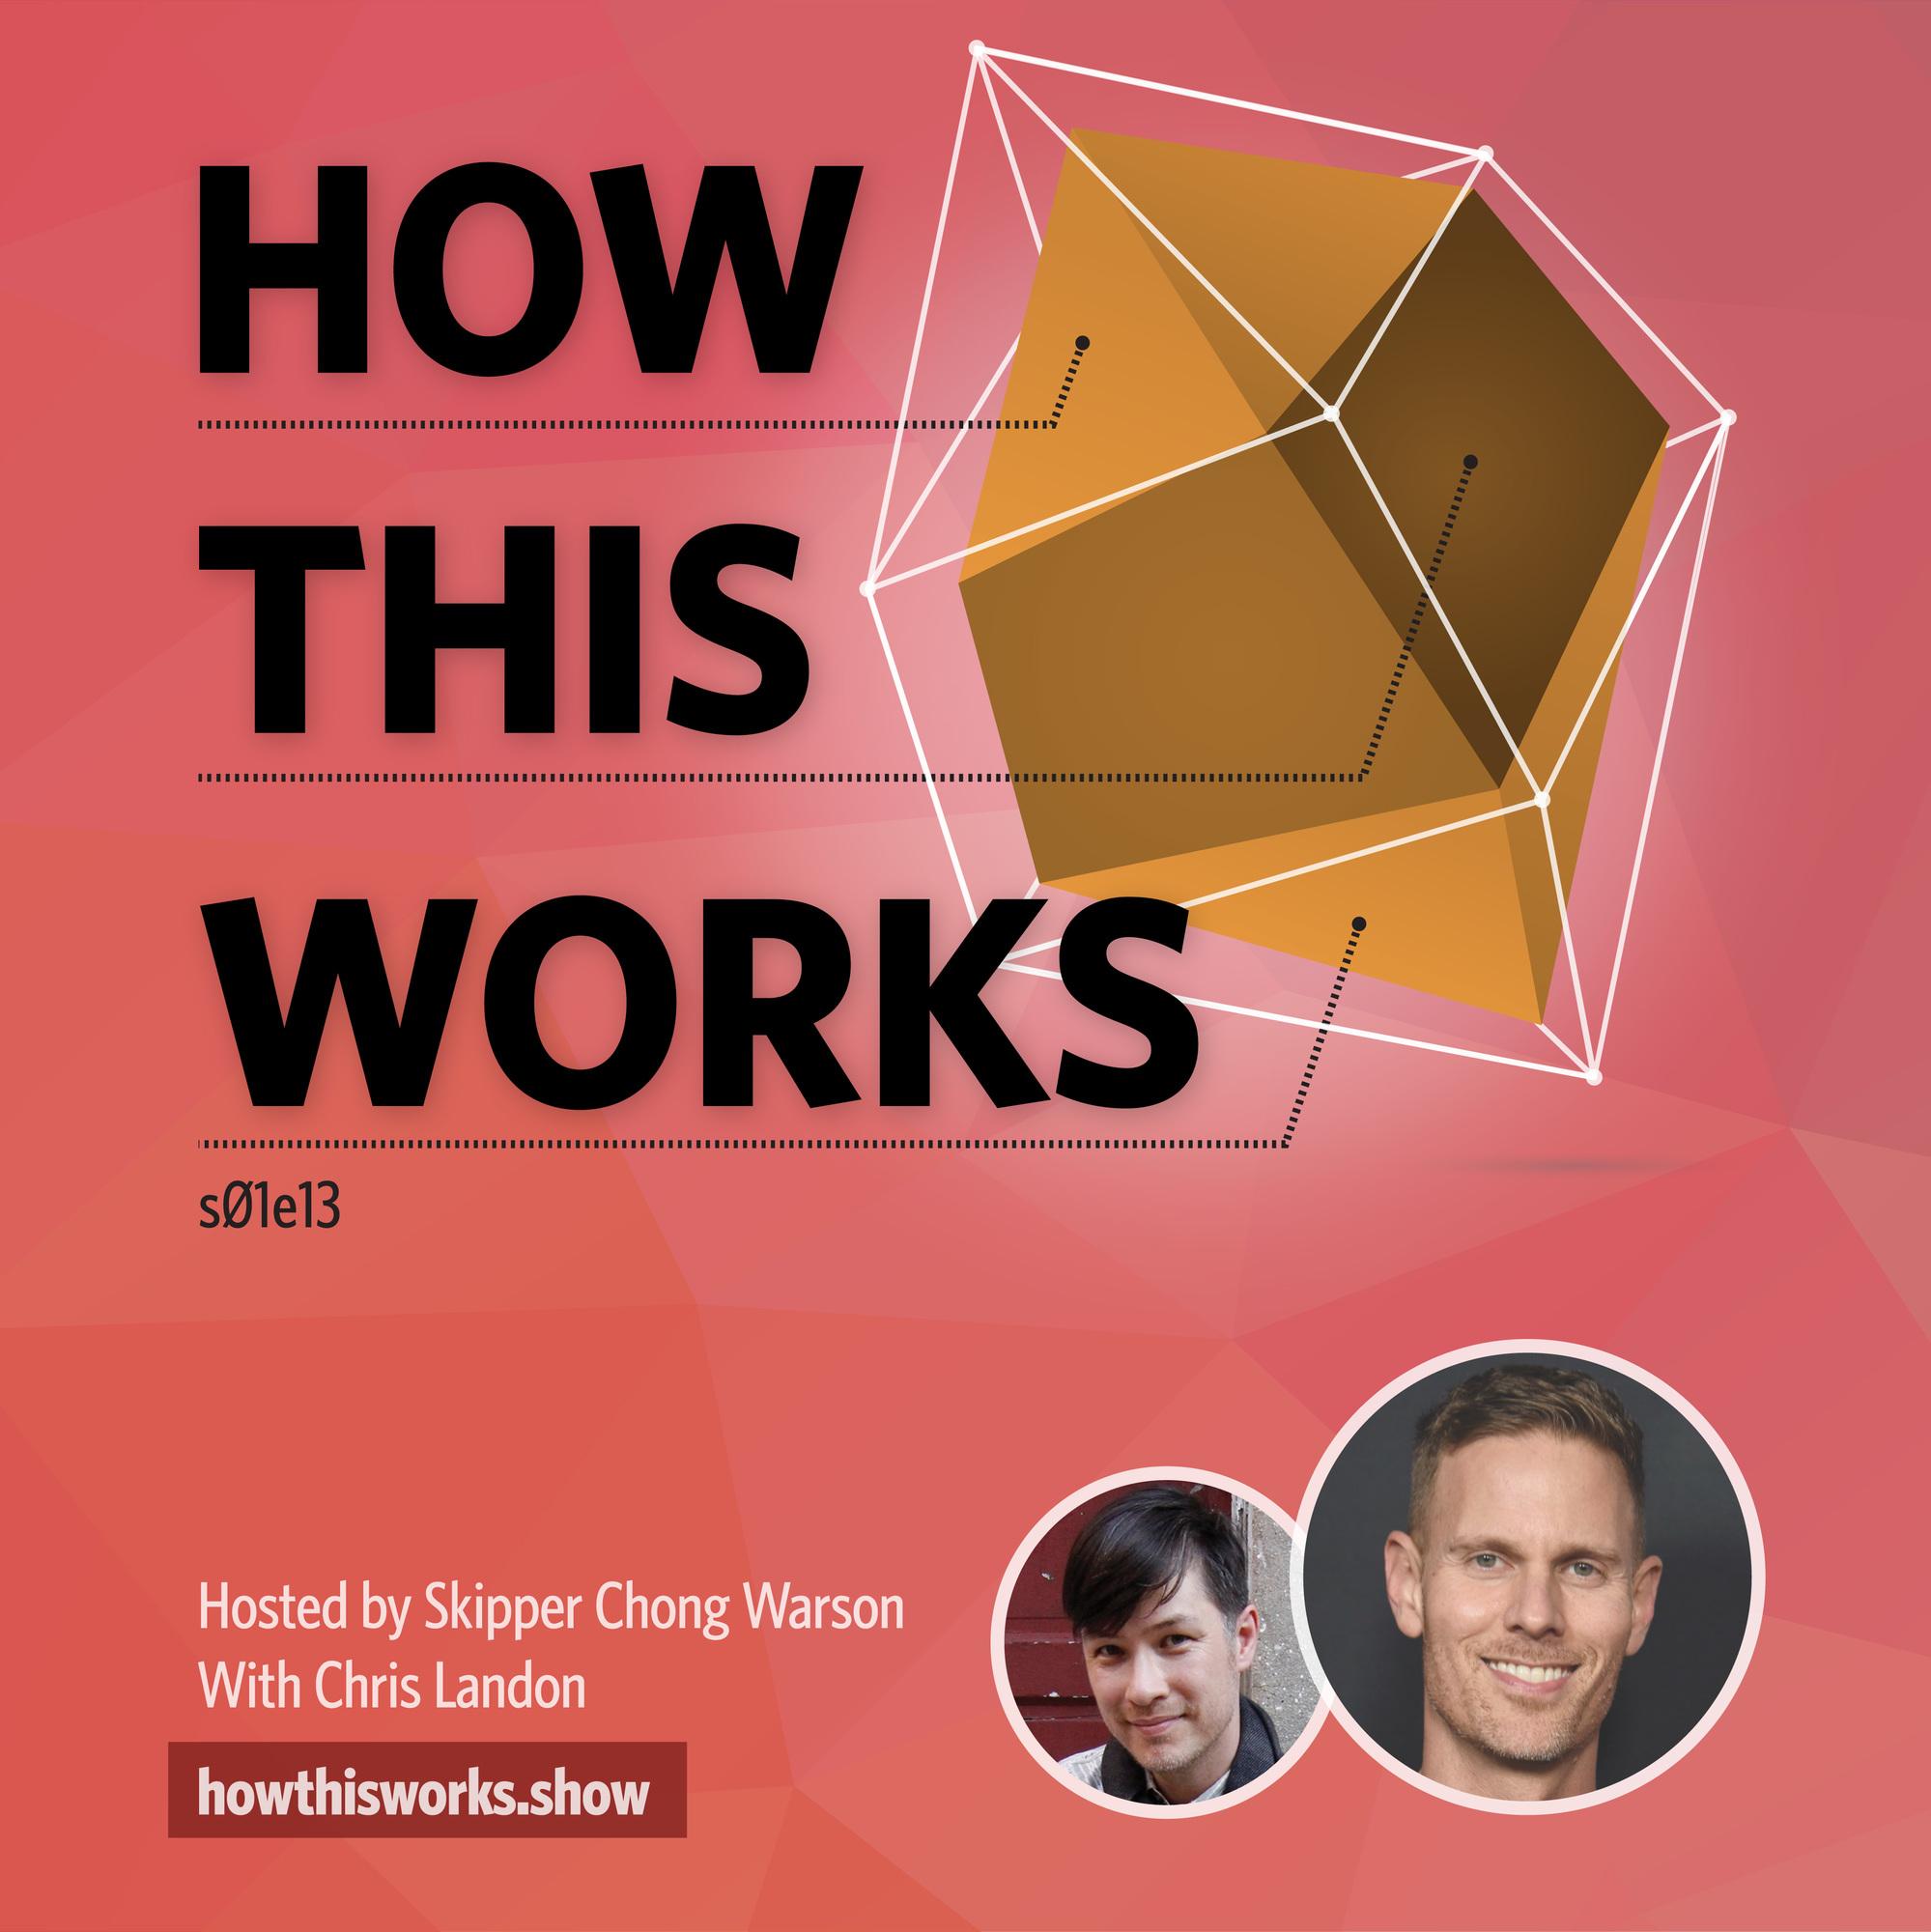 How This Works - Chris Landon